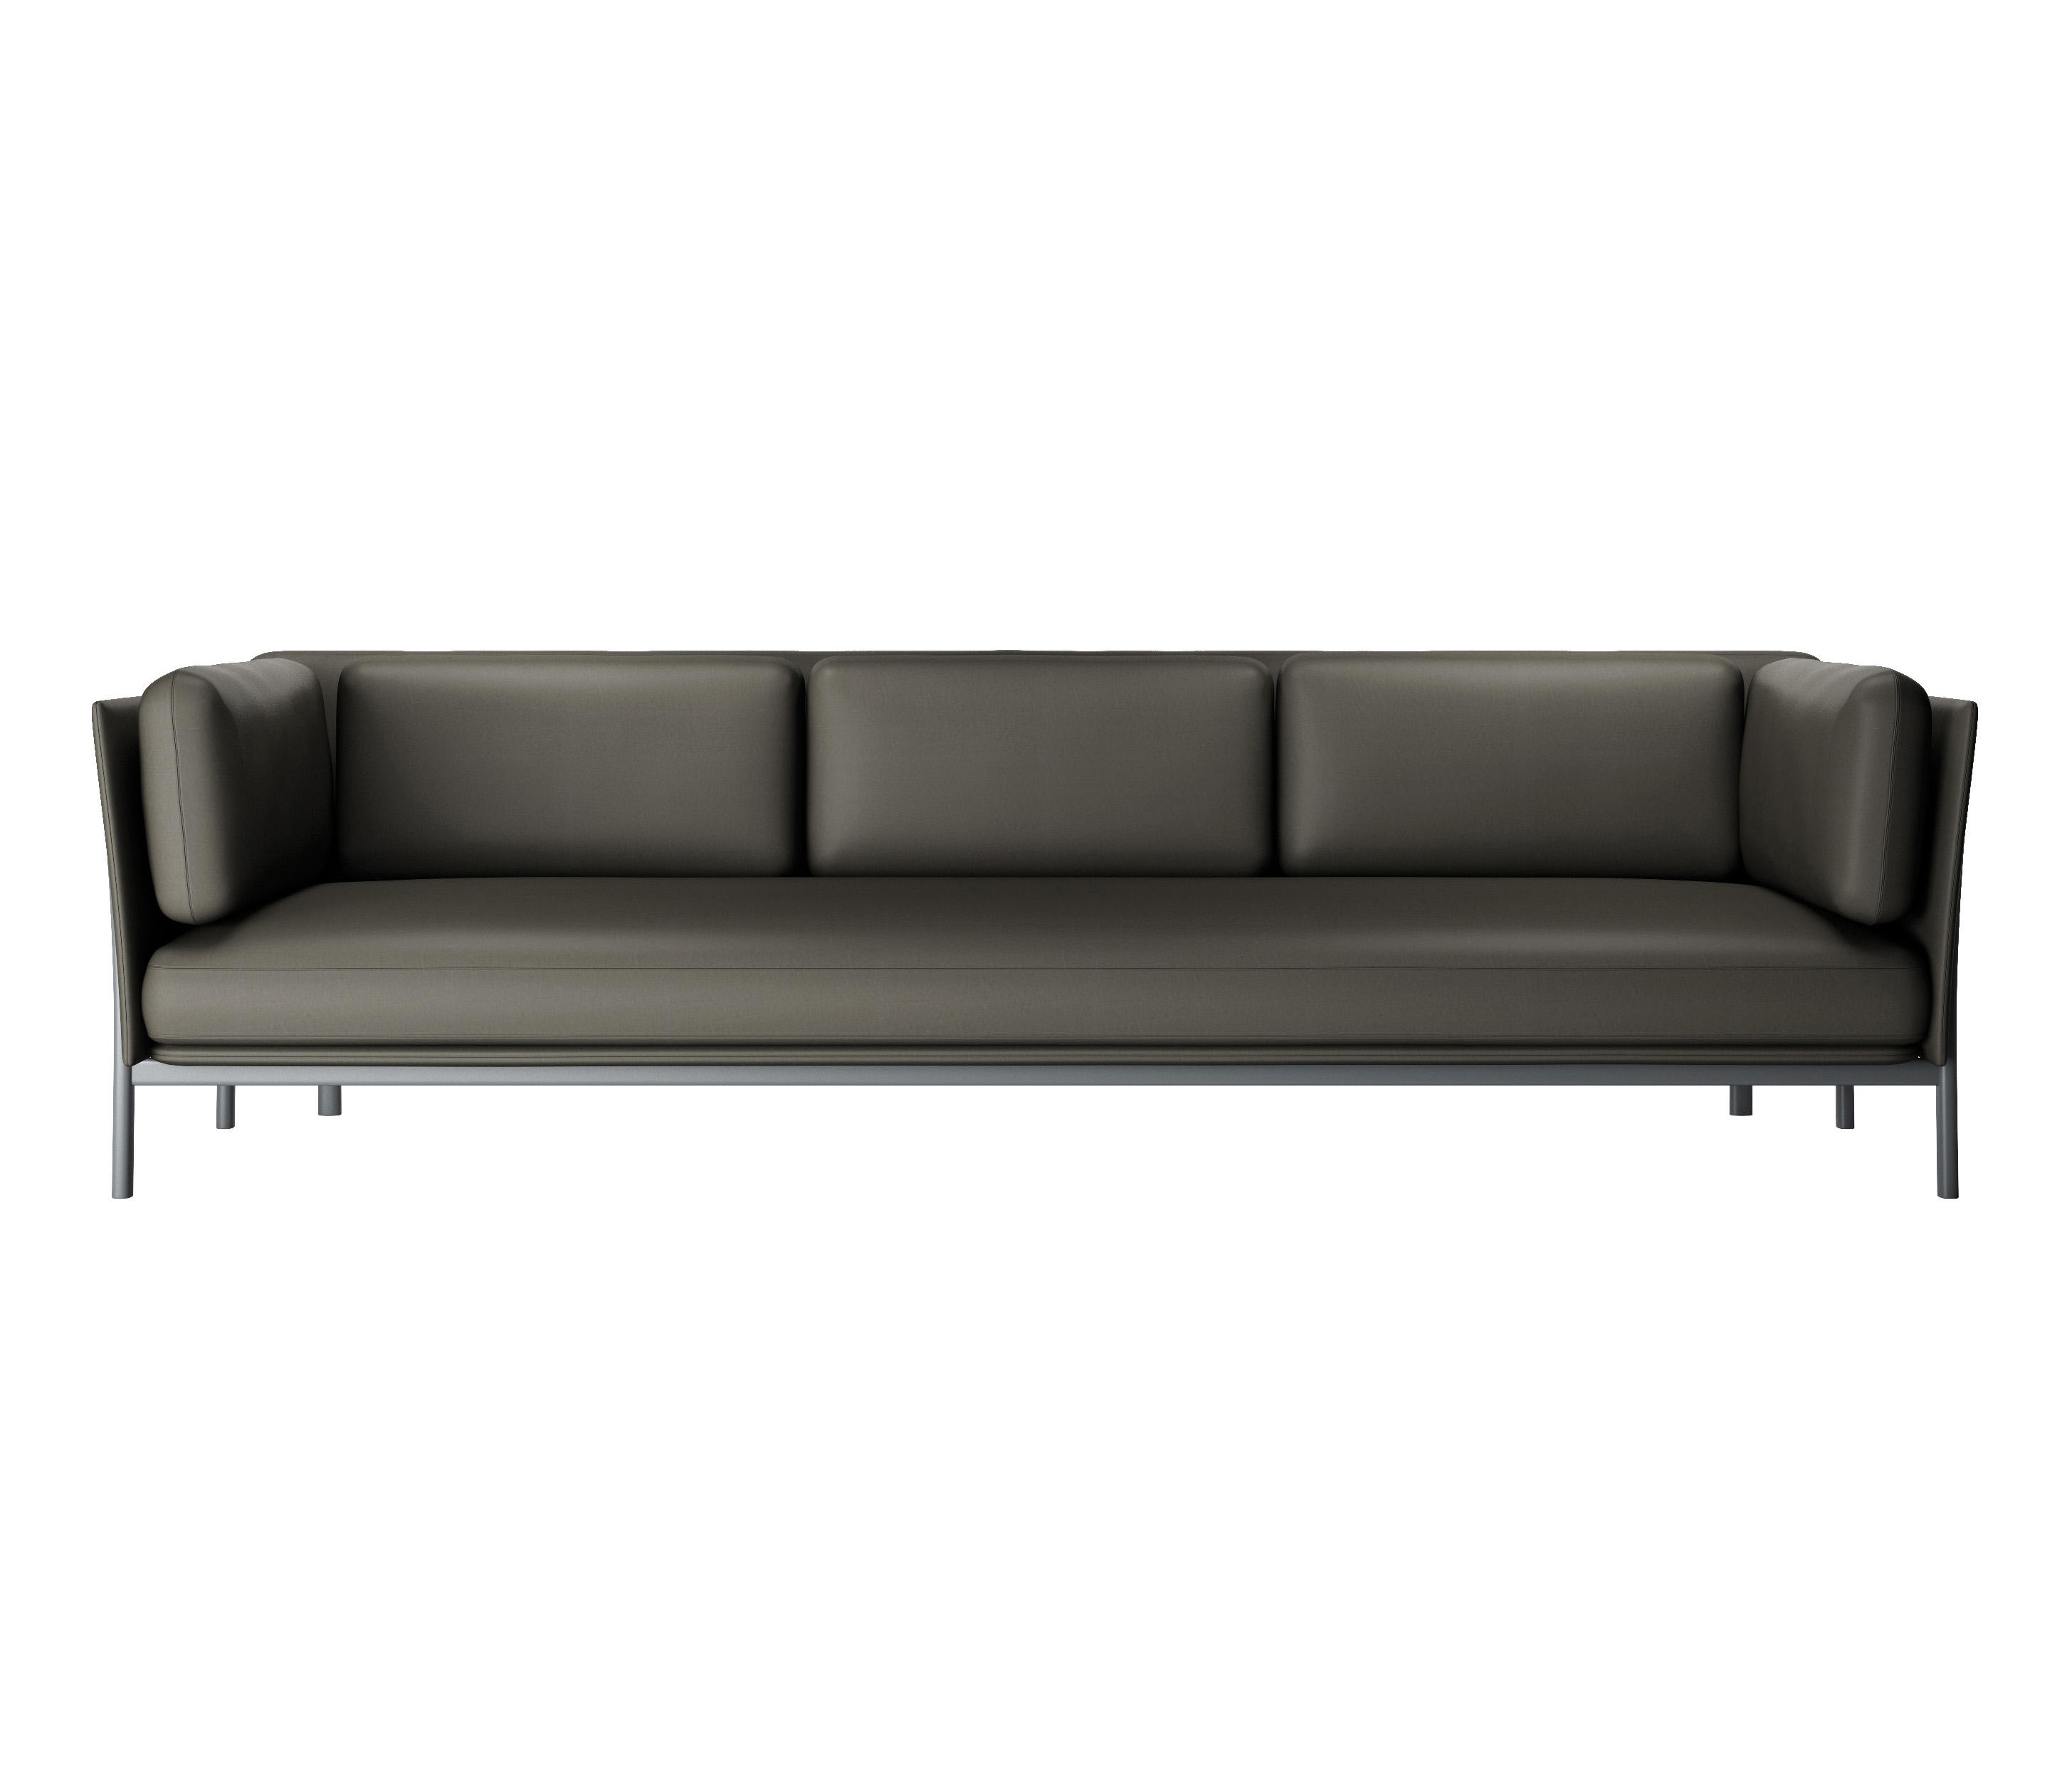 twelve 3 seats sofa sofas von alias architonic. Black Bedroom Furniture Sets. Home Design Ideas